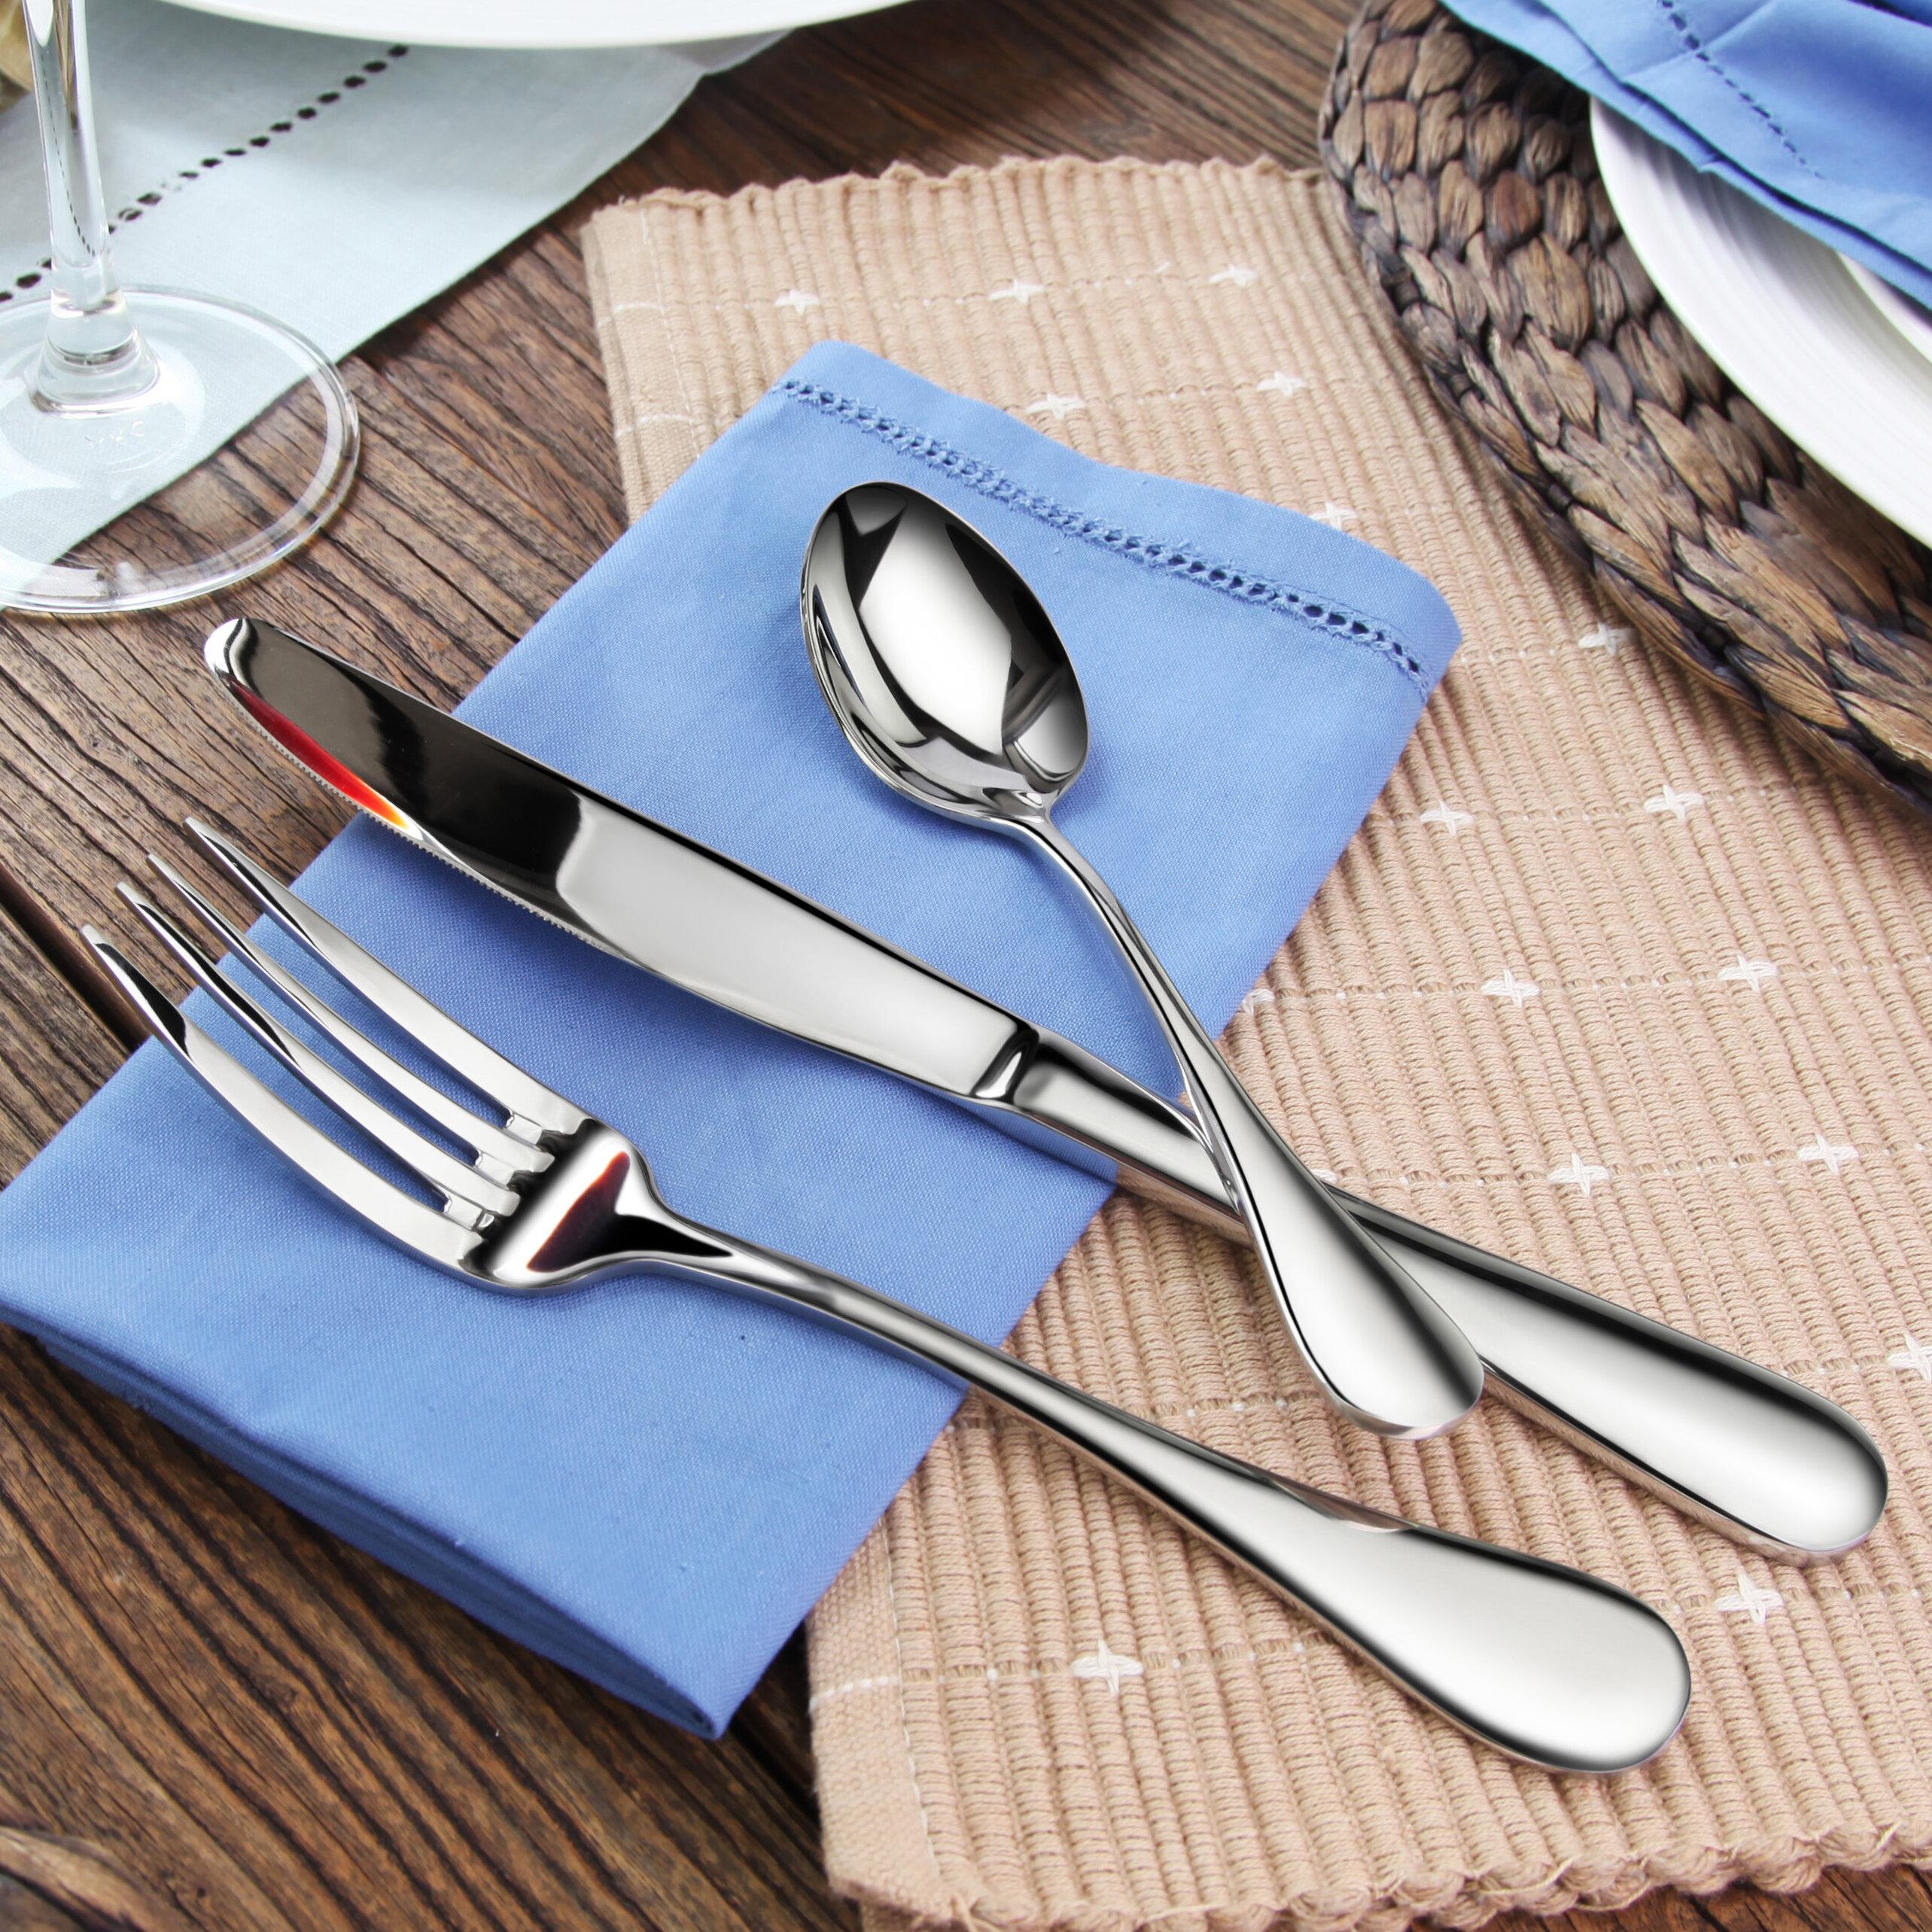 New Star Food Service Rain 36 Piece 18/10 Stainless Steel Flatware ...